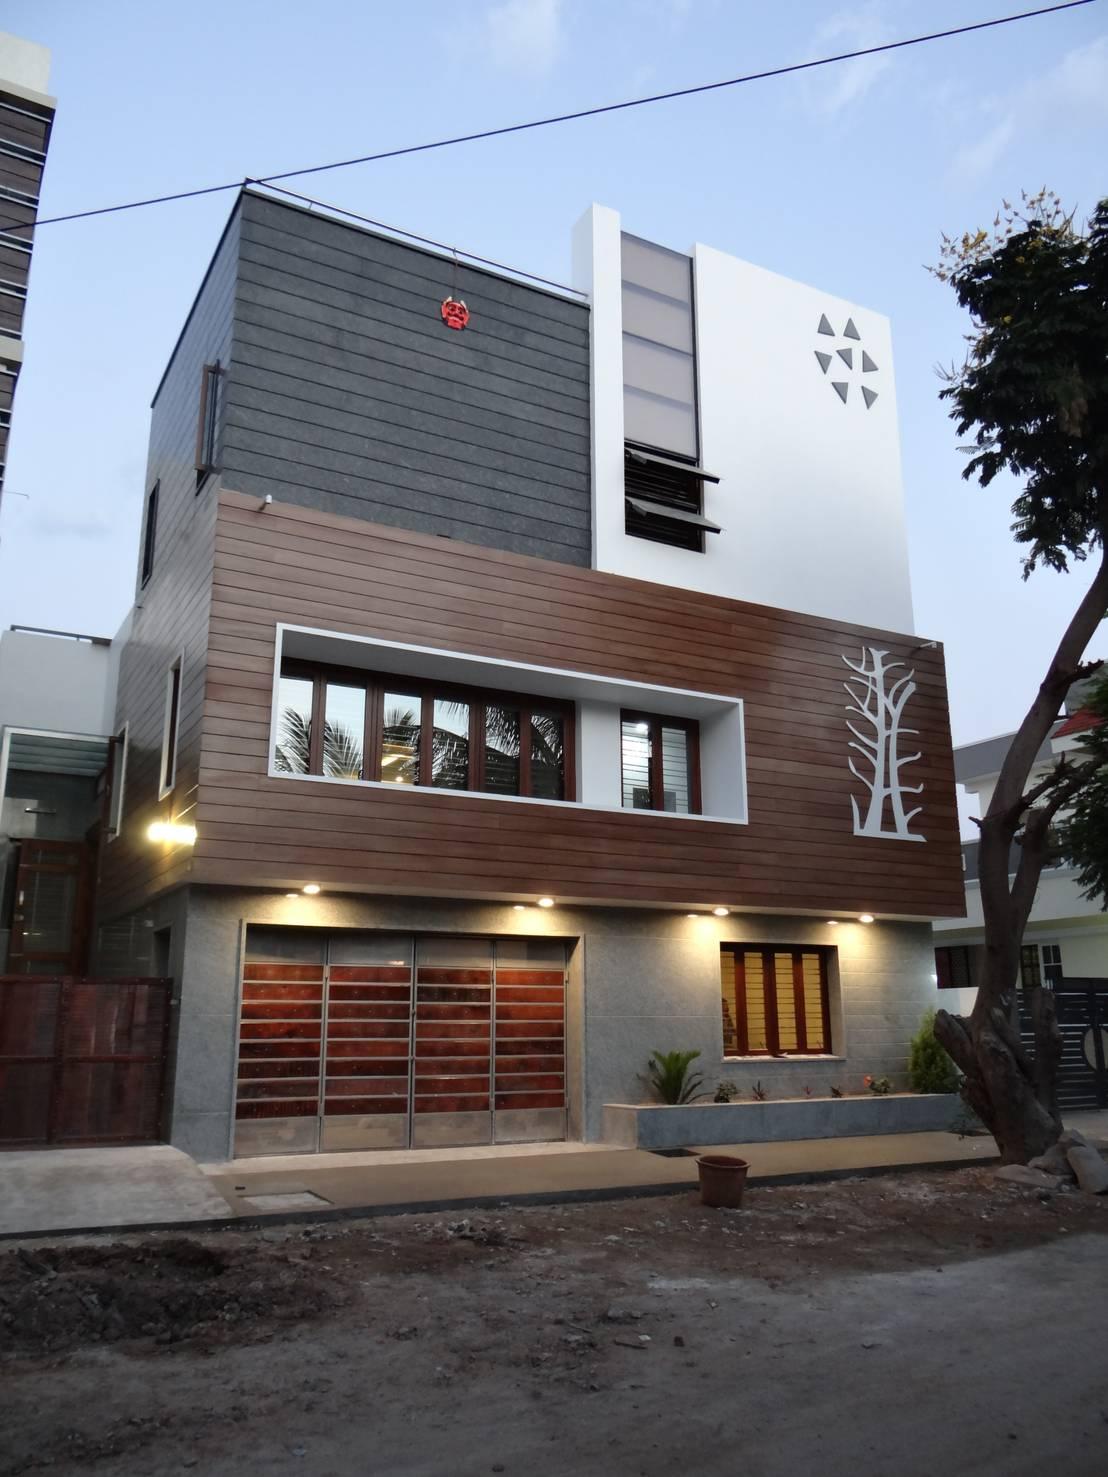 Top 5 Modern Houses From Karnataka Feng Shui Tips